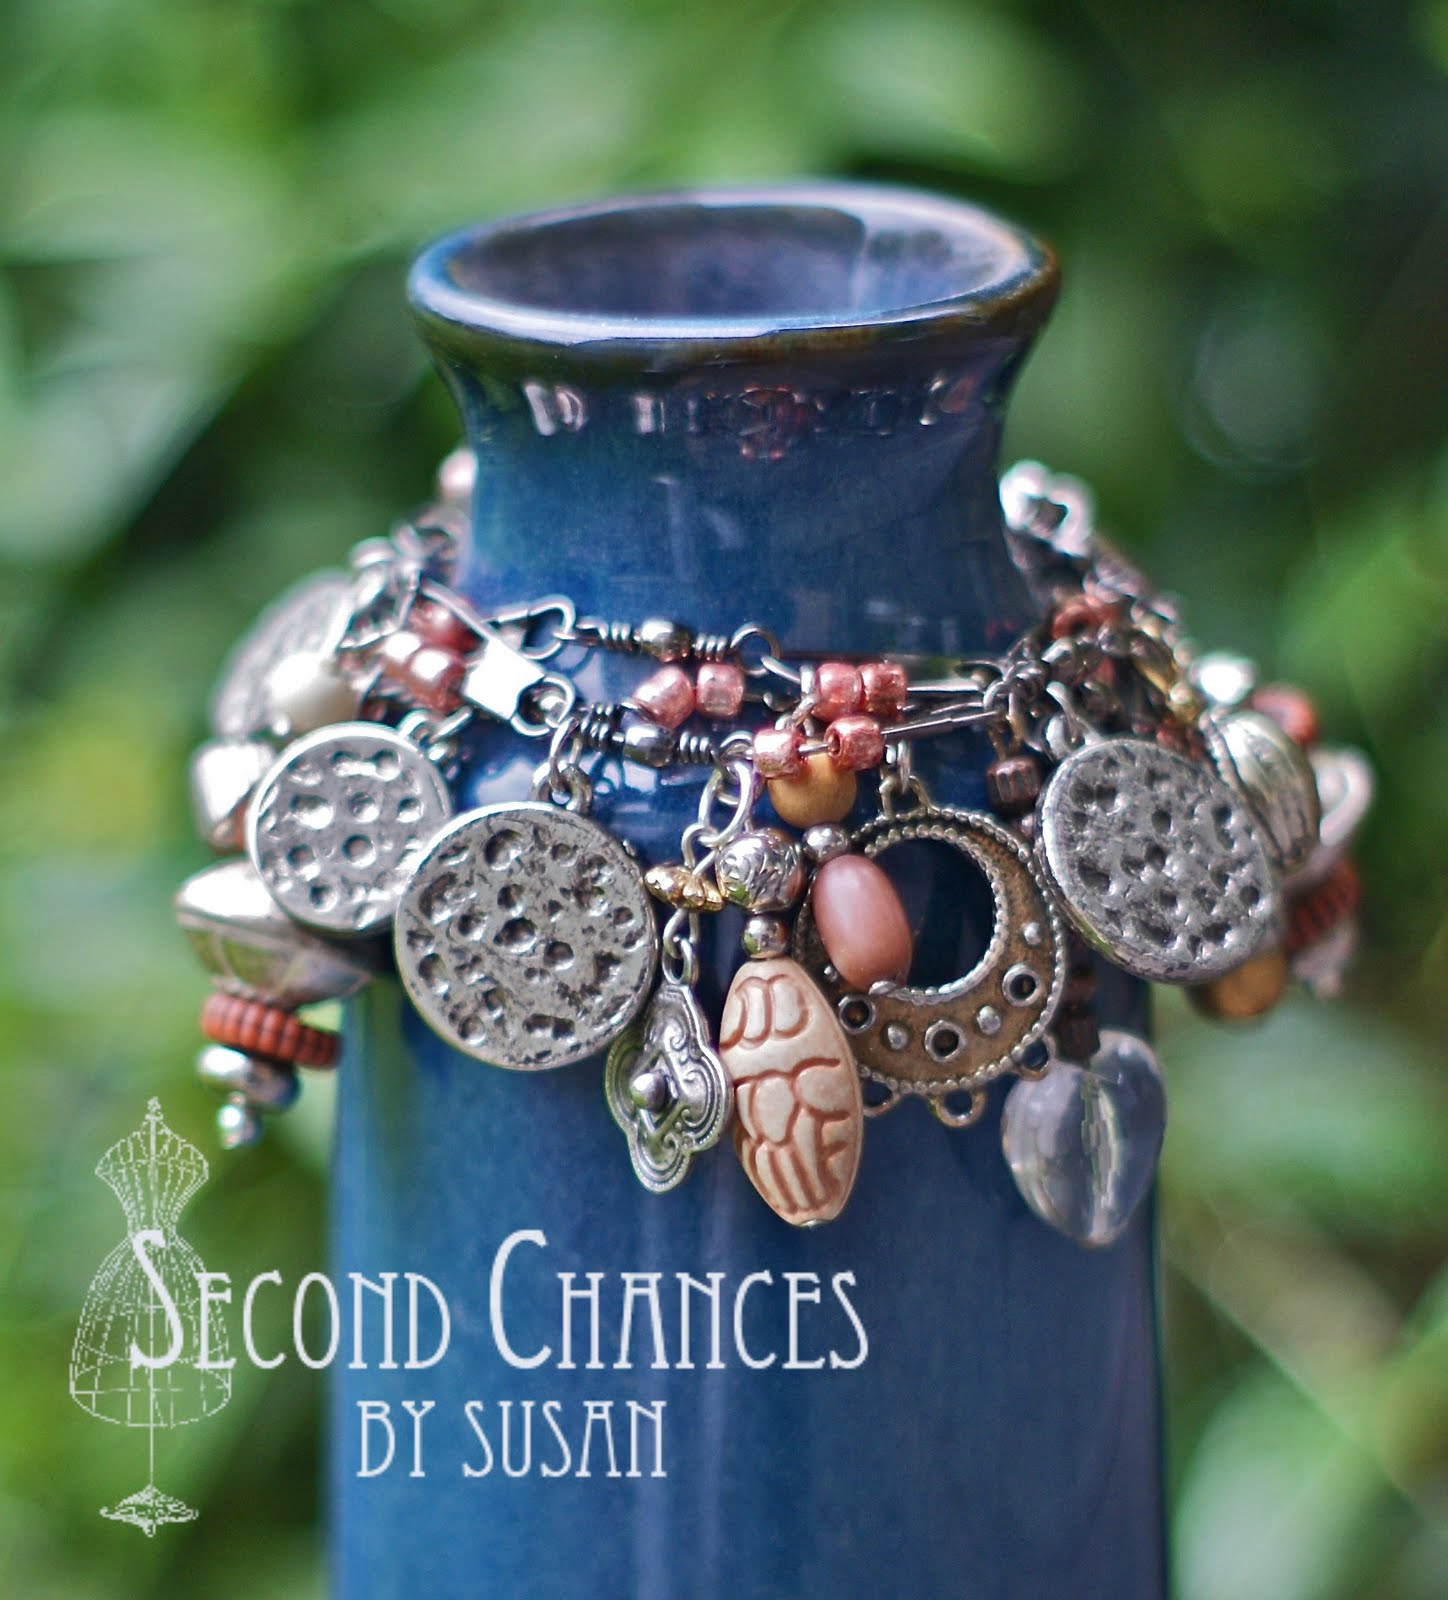 Second Chances By Susan Fishing Swivel Charm Bracelet